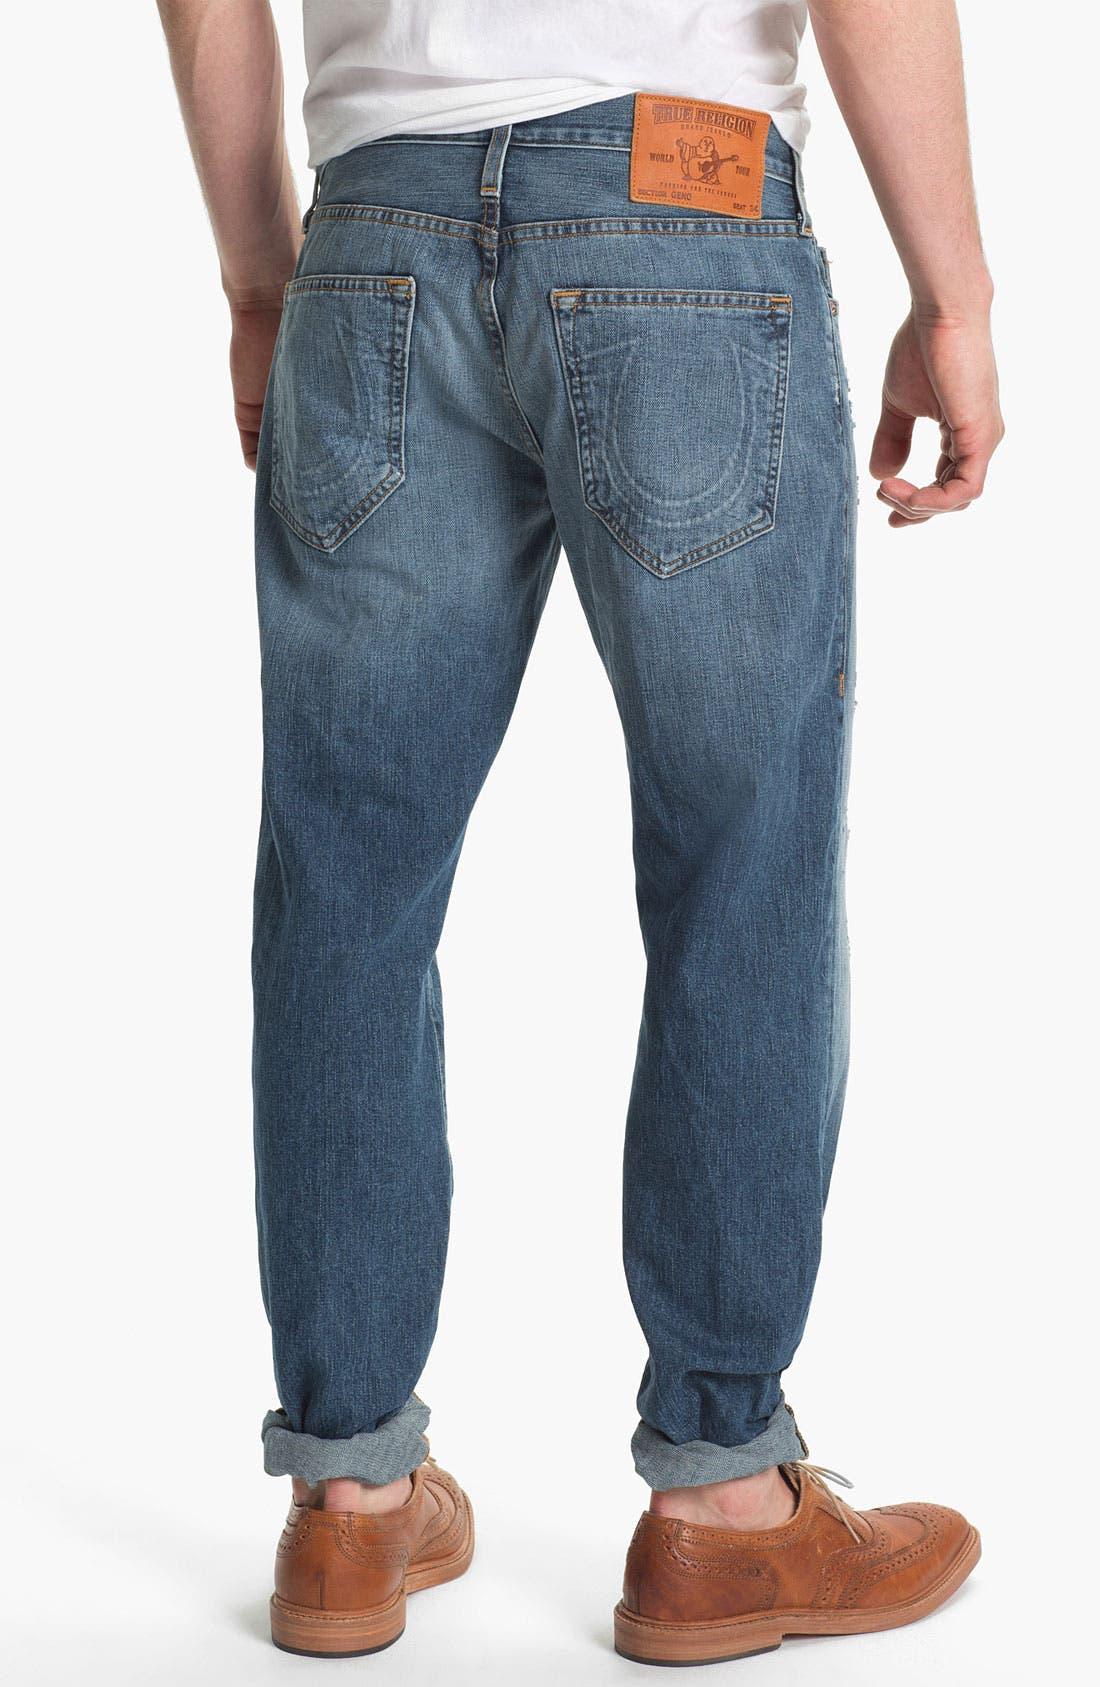 Main Image - True Religion Brand Jeans 'Geno 1971' Slim Straight Leg Jeans (Sepulvada)